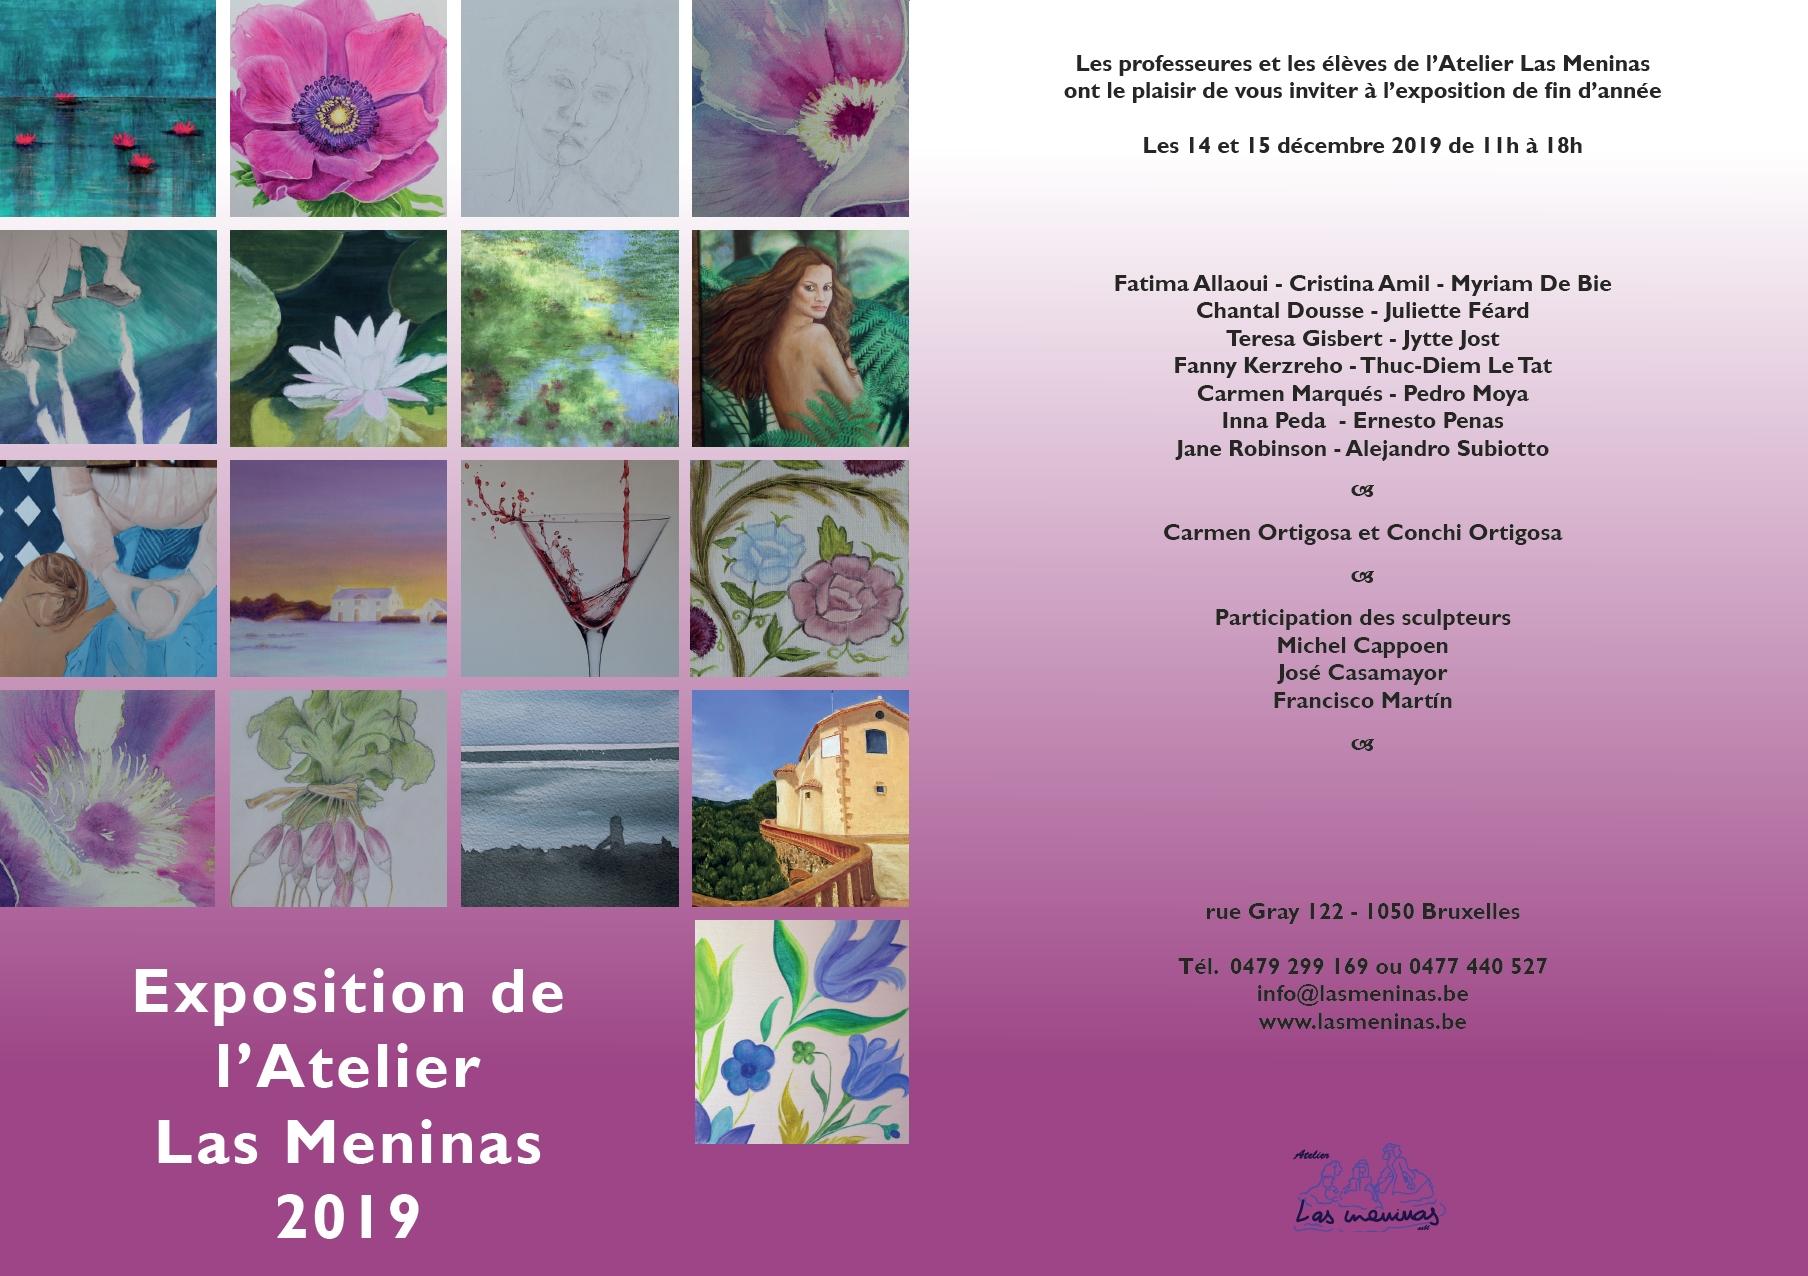 Expo Atelier Las Meninas